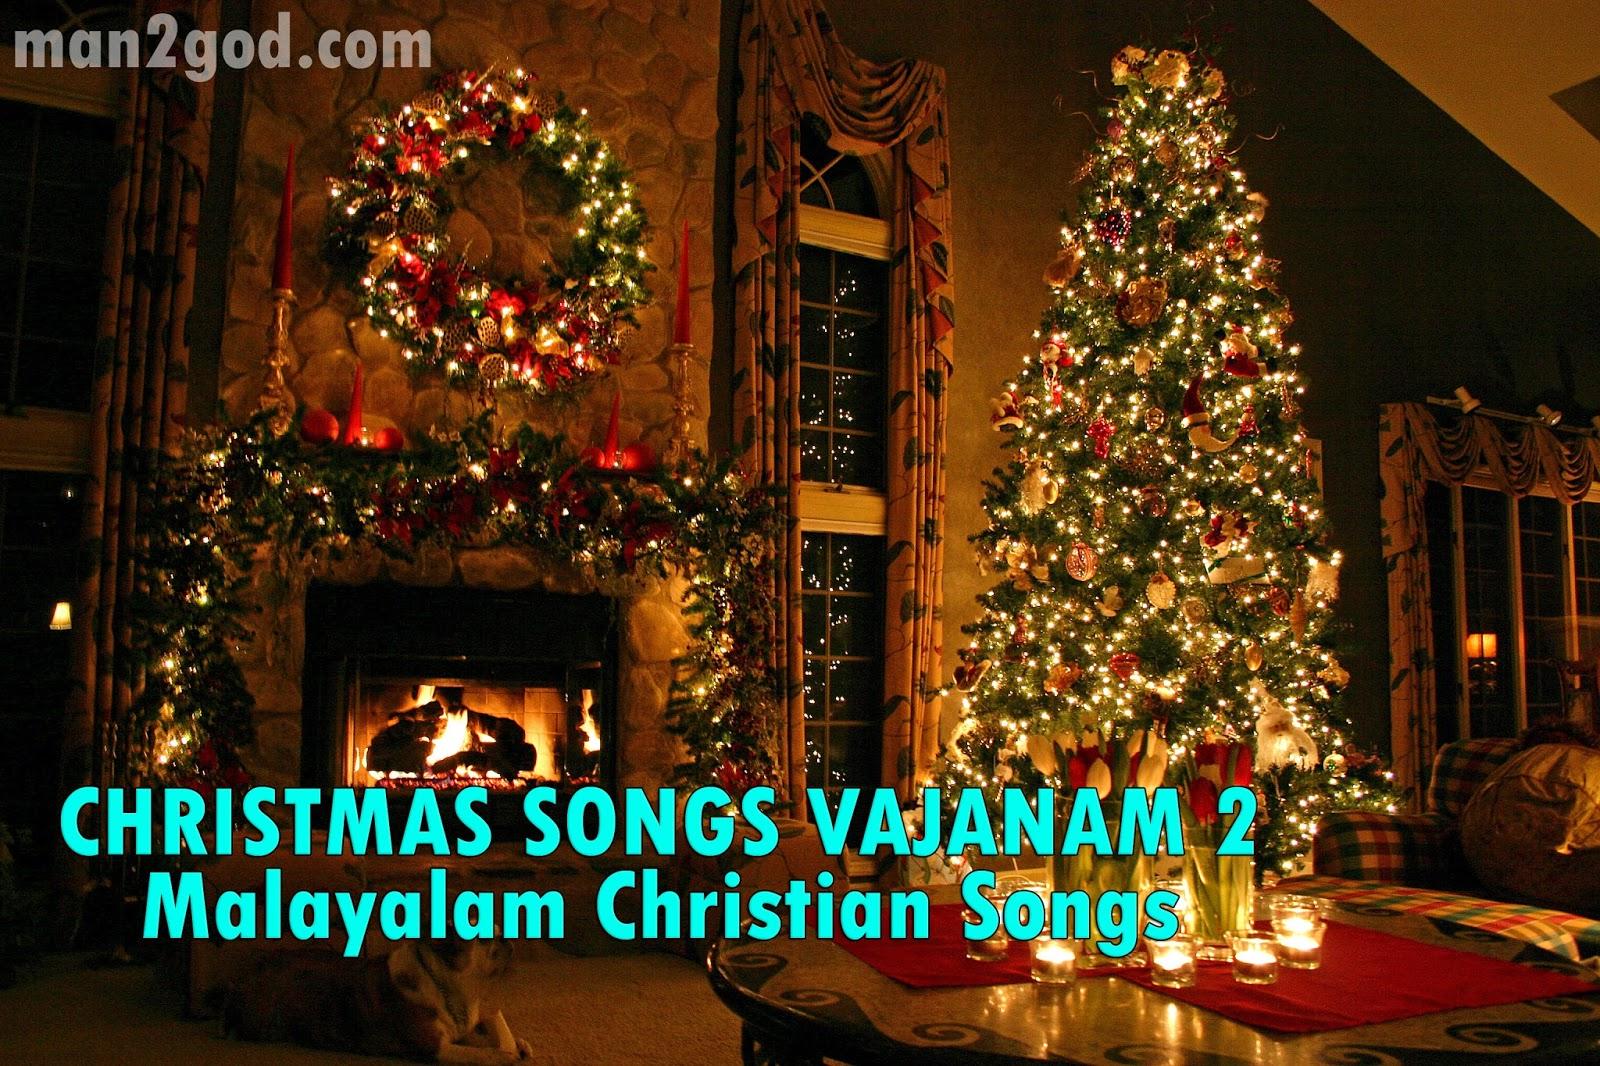 tamil christmas carol songs mp3 download